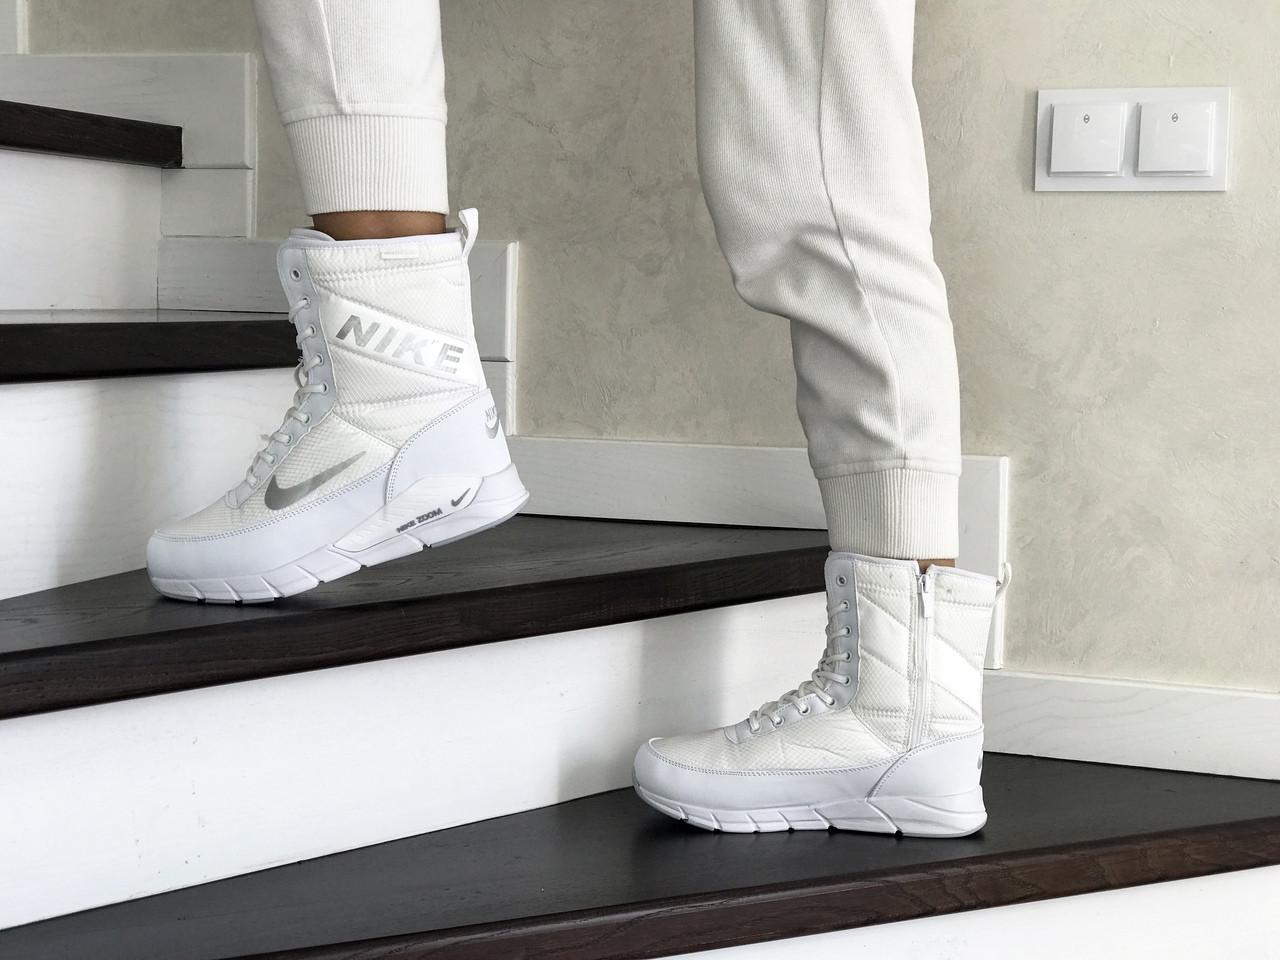 Зимние сапоги Nike, женские сапоги.ТОП КАЧЕСТВО!!! Реплика класса люкс (ААА+)